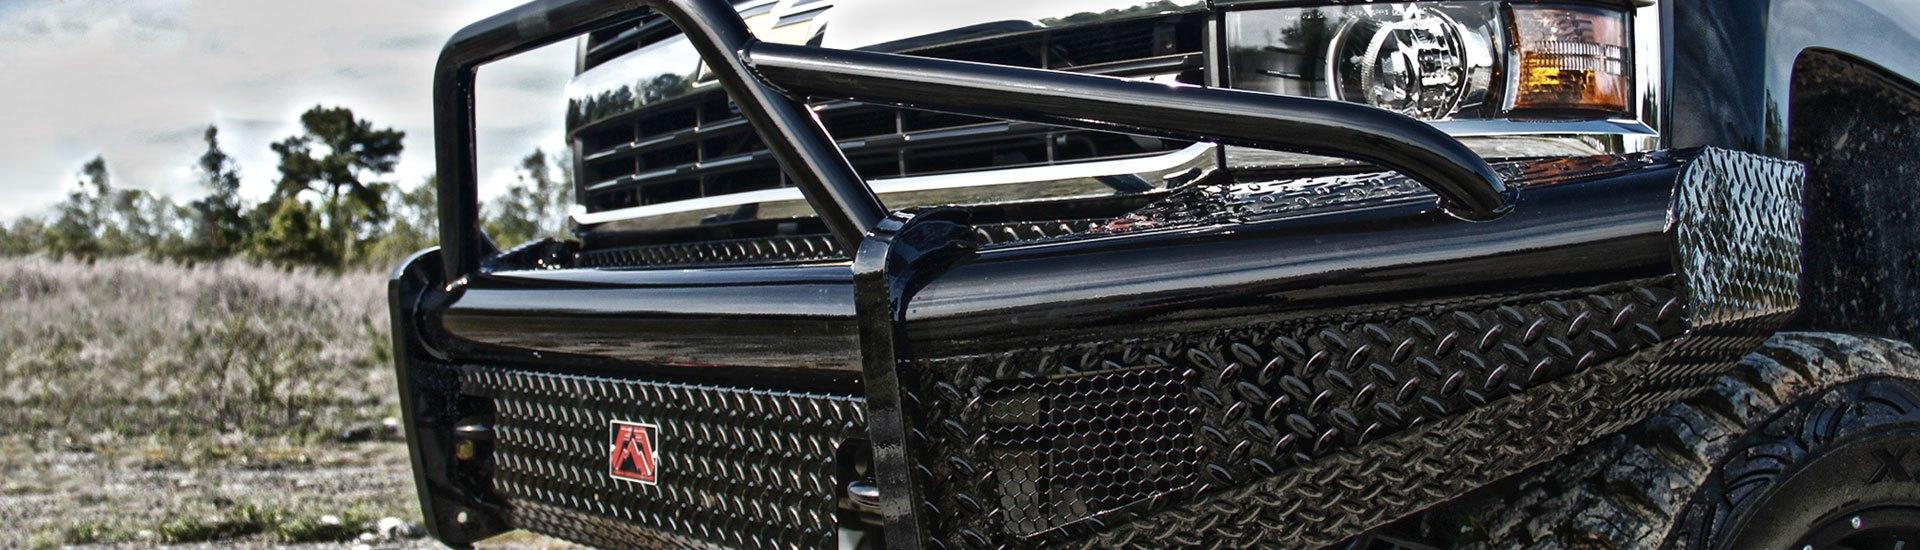 Design of a car bumper - 1 11 Select Vehicle